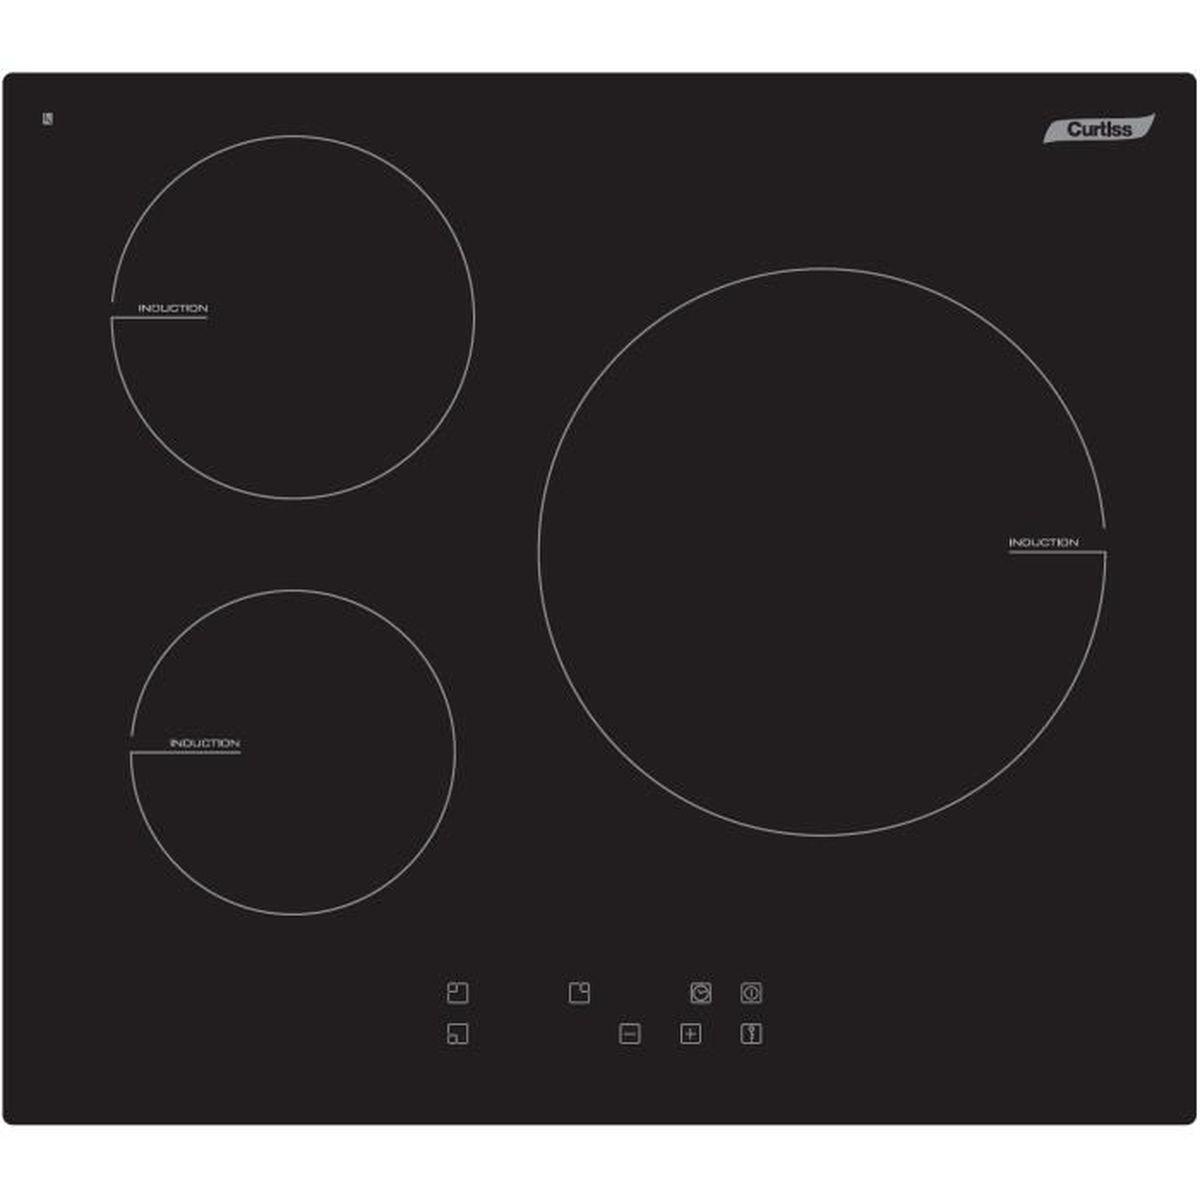 table de cuisson induction curtiss mi358 s achat vente. Black Bedroom Furniture Sets. Home Design Ideas